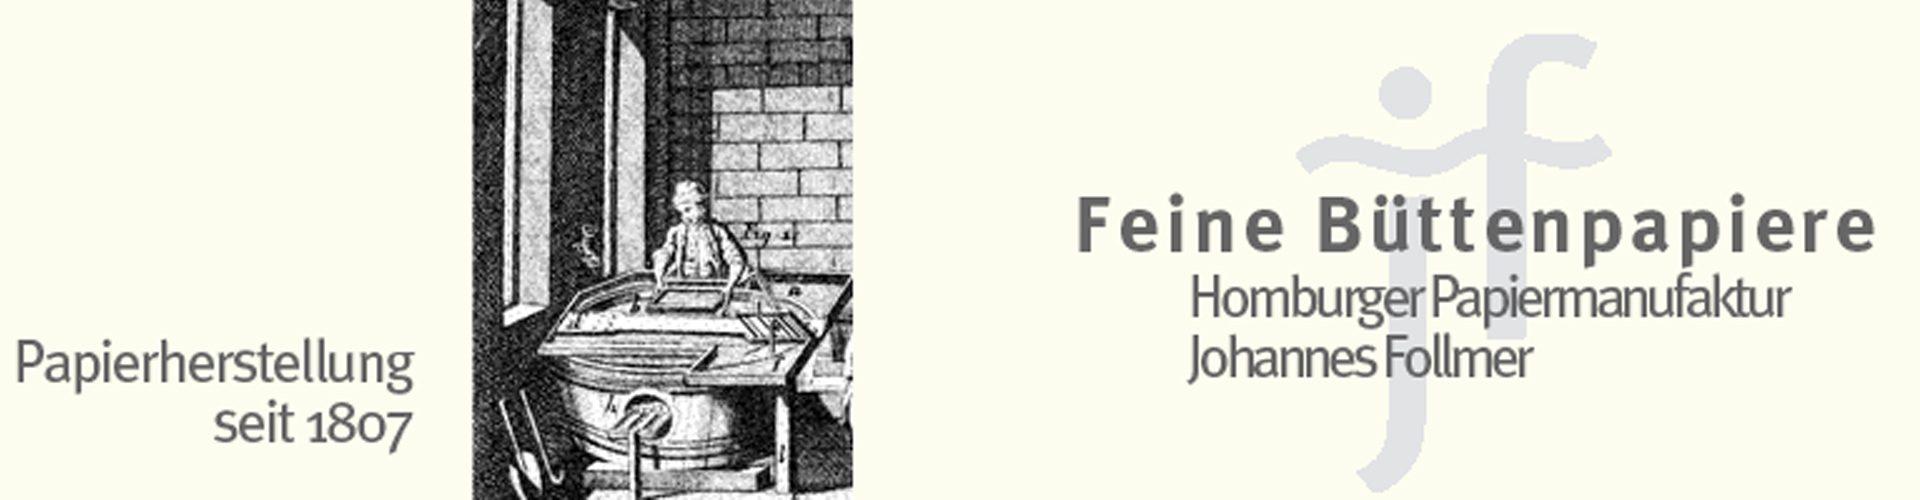 GraphikundGestaltung Christoph Fincke Kunden: Papiermanufaktur Homburg Johannes Follmer